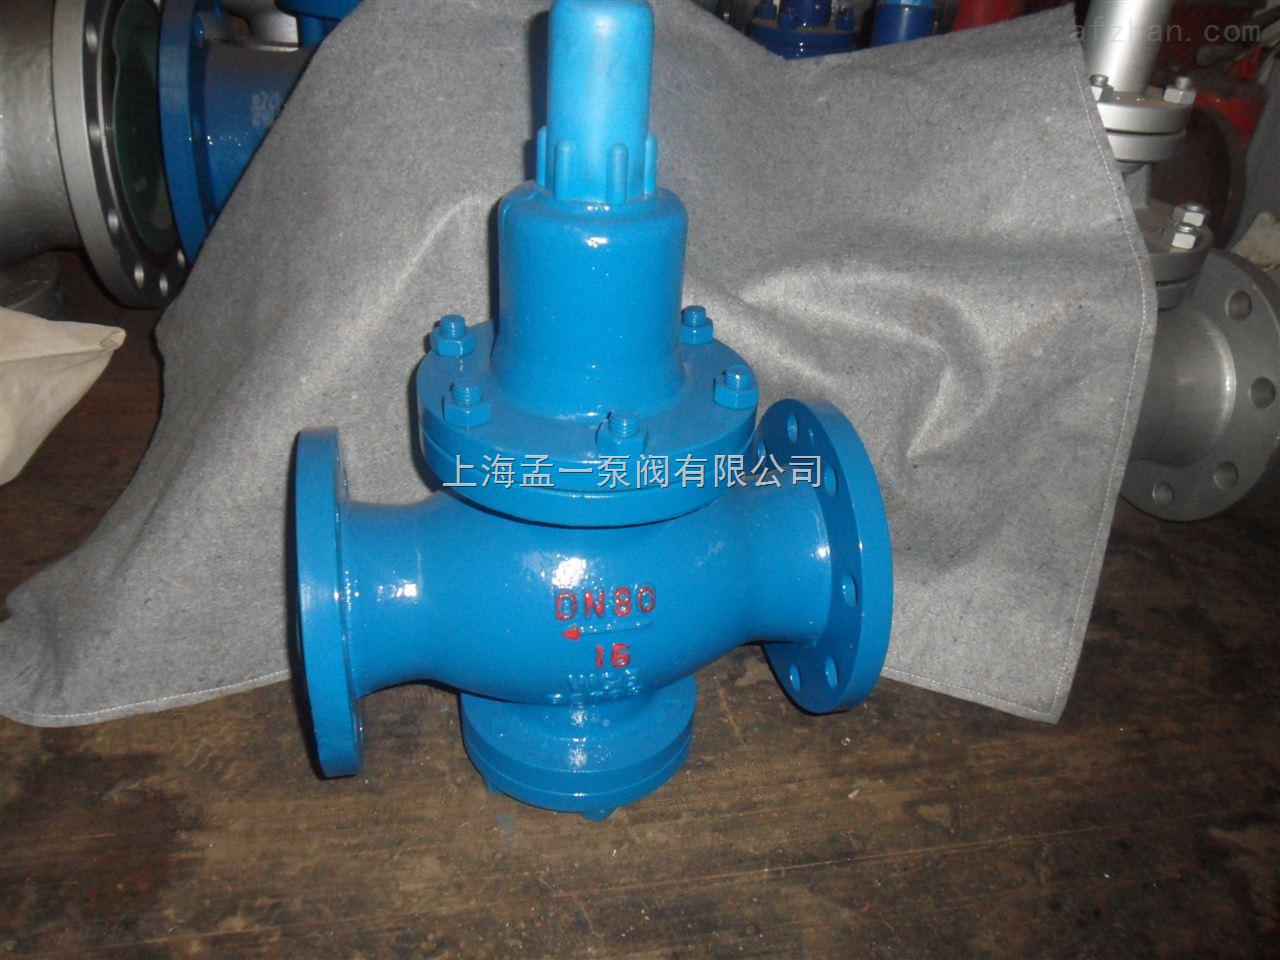 y42x-16c-dn80 水用减压阀图片